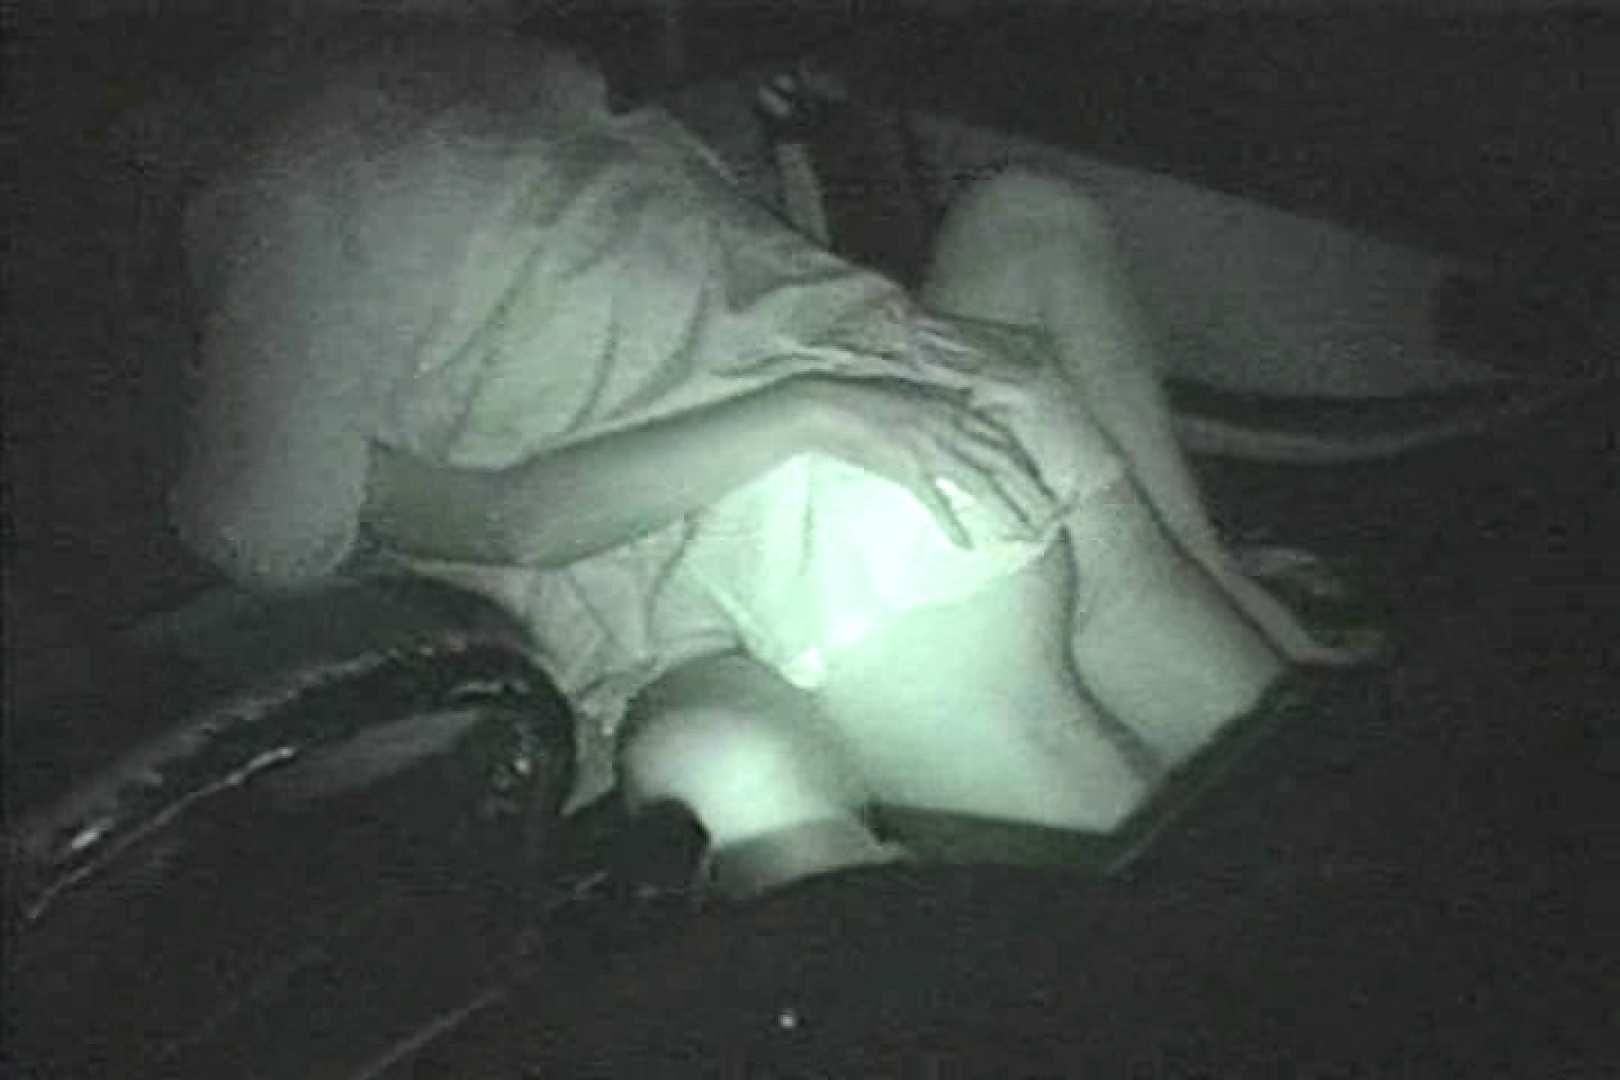 MASAさんの待ち伏せ撮り! 赤外線カーセックスVol.11 喘ぎ 覗きおまんこ画像 81画像 79